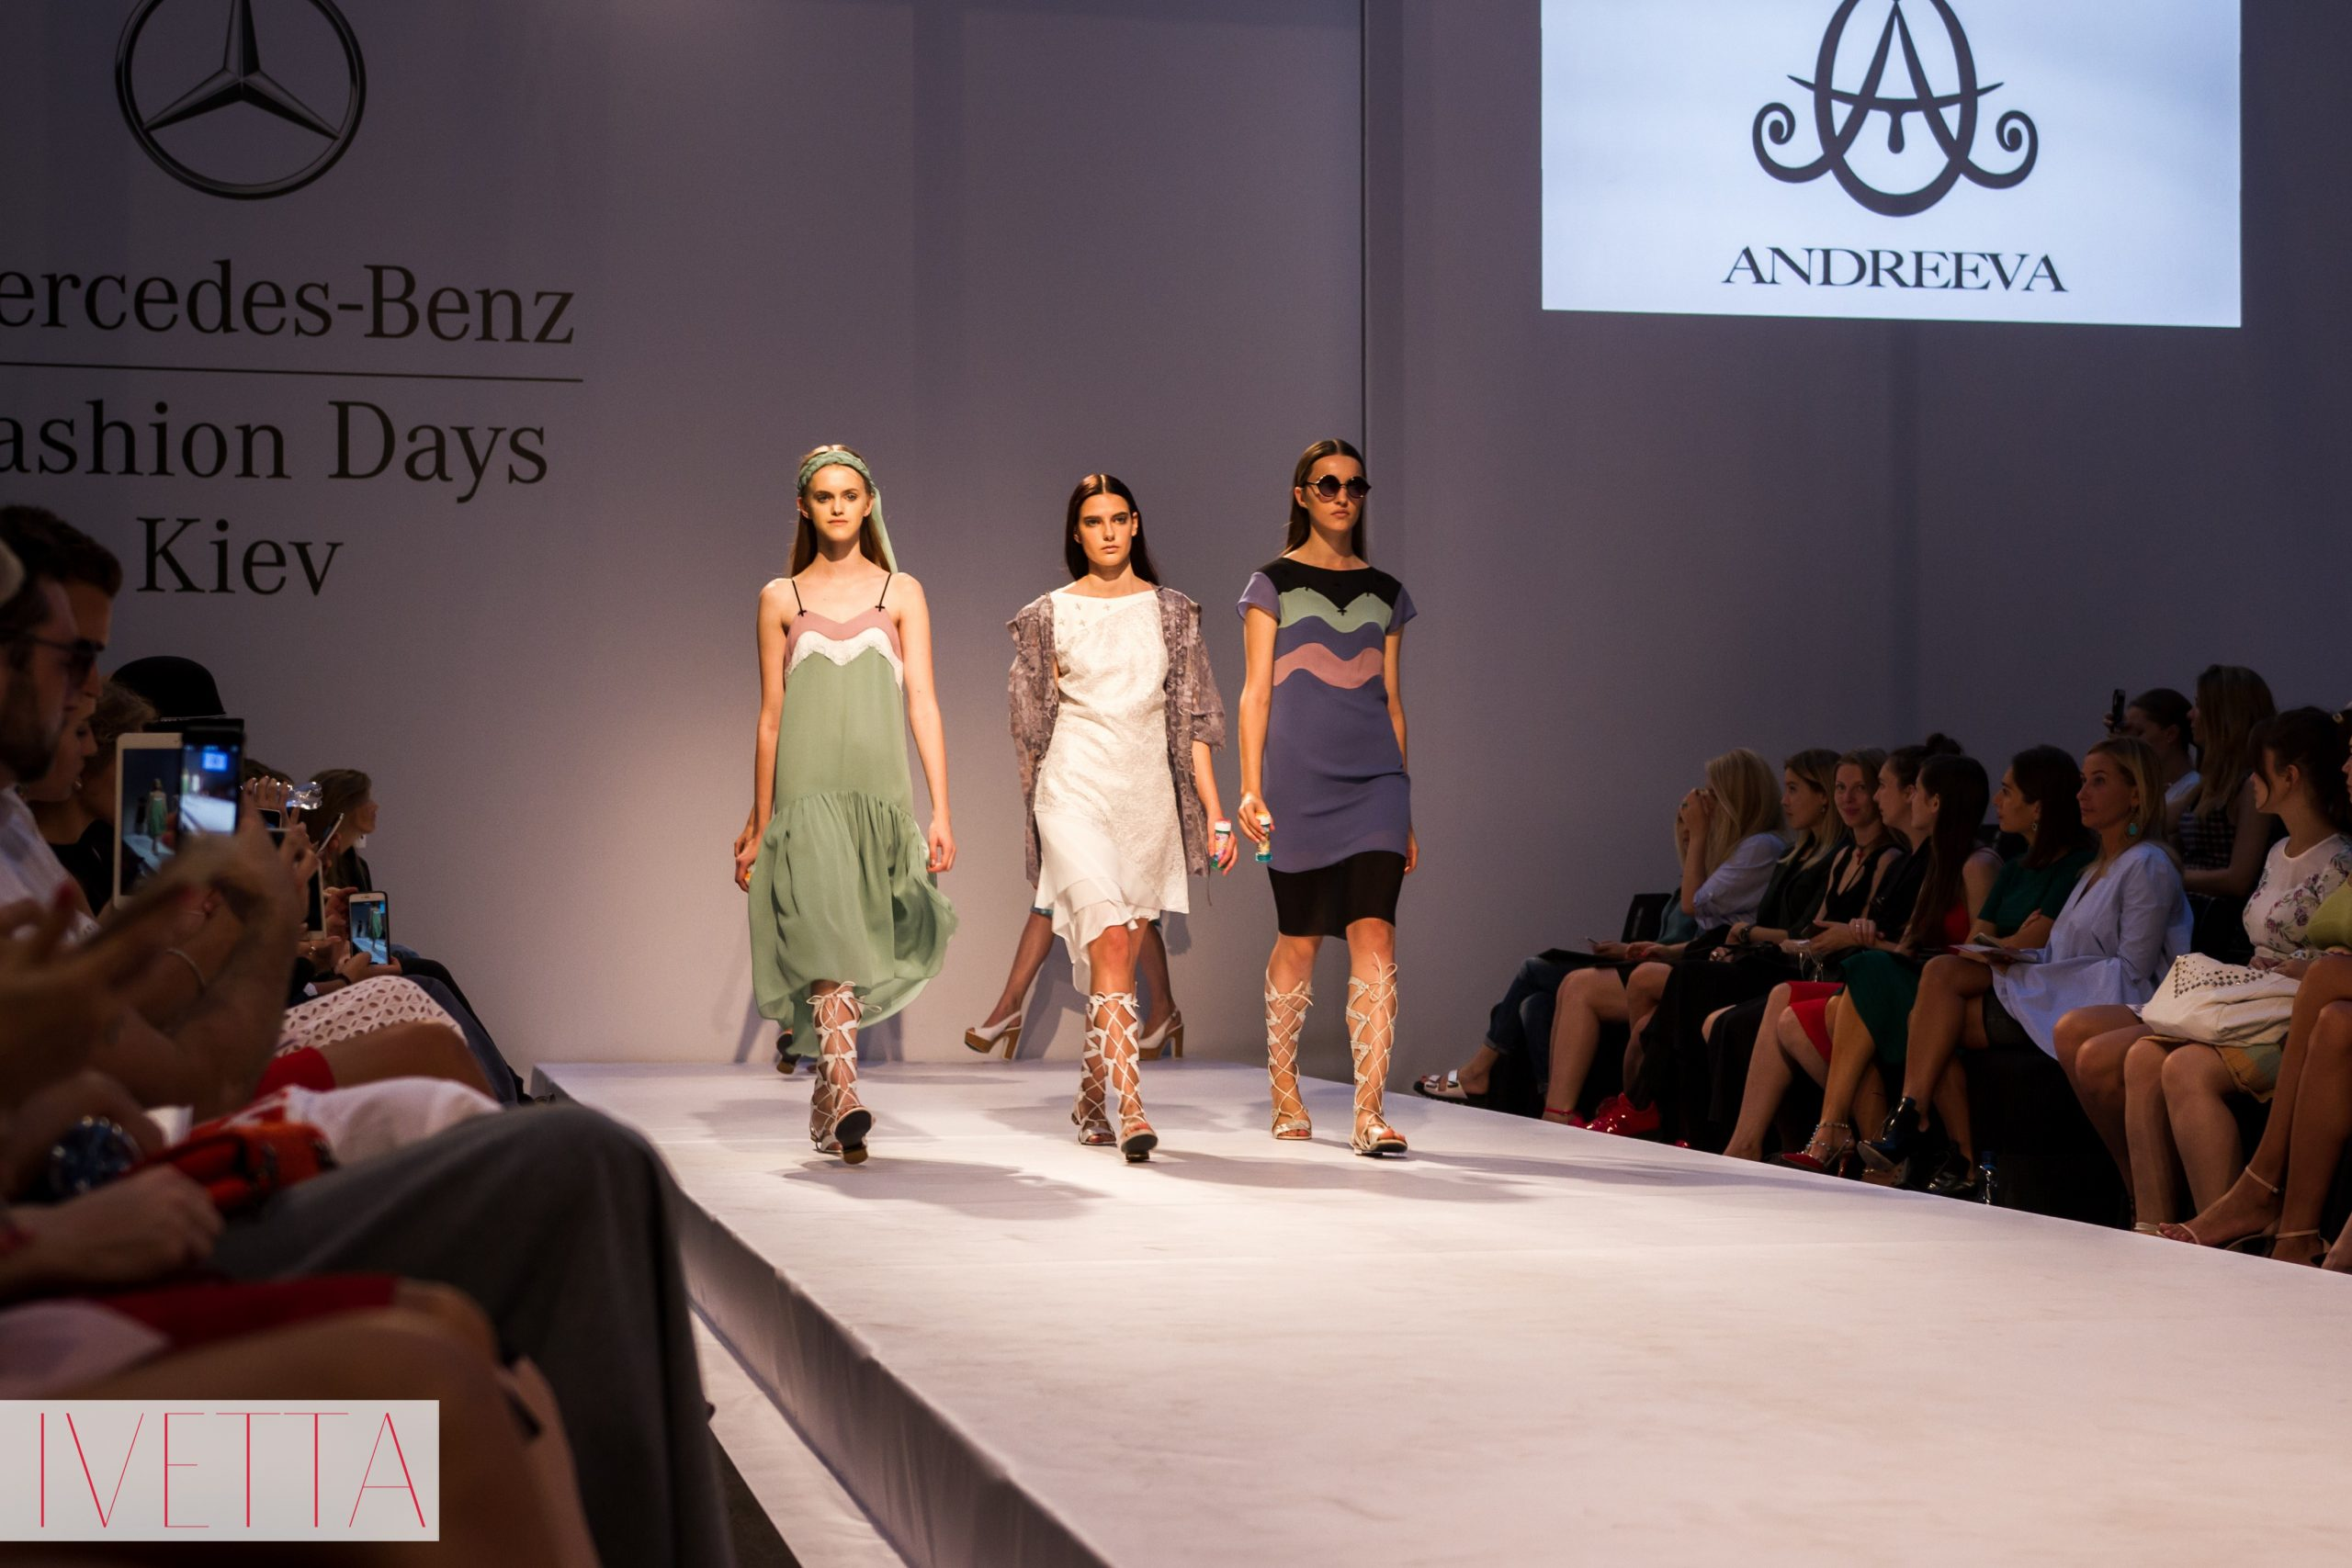 Коллекция Andreeva на Mercedes-Benz Kiev Fashion Days 2015 22